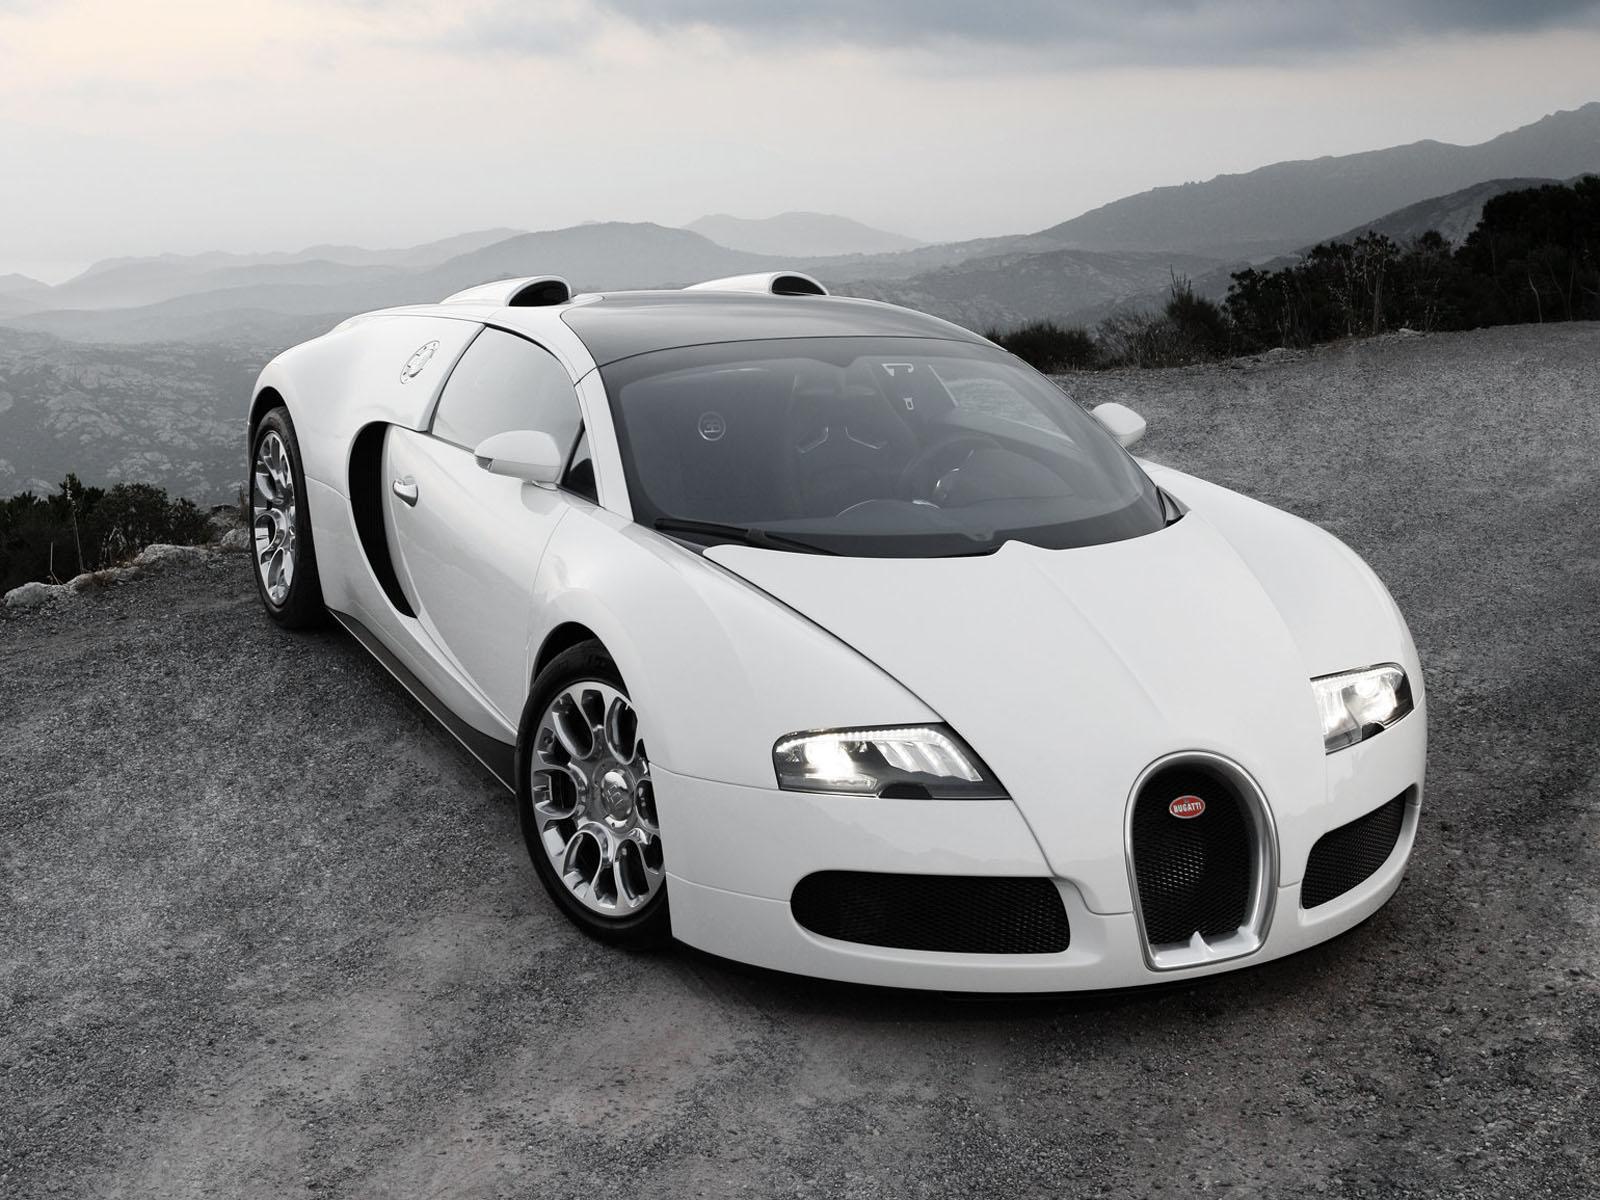 bugatti veyron wallpapers hd 559 wallpaper cool walldiskpapercom - Bugatti Veyron Wallpaper